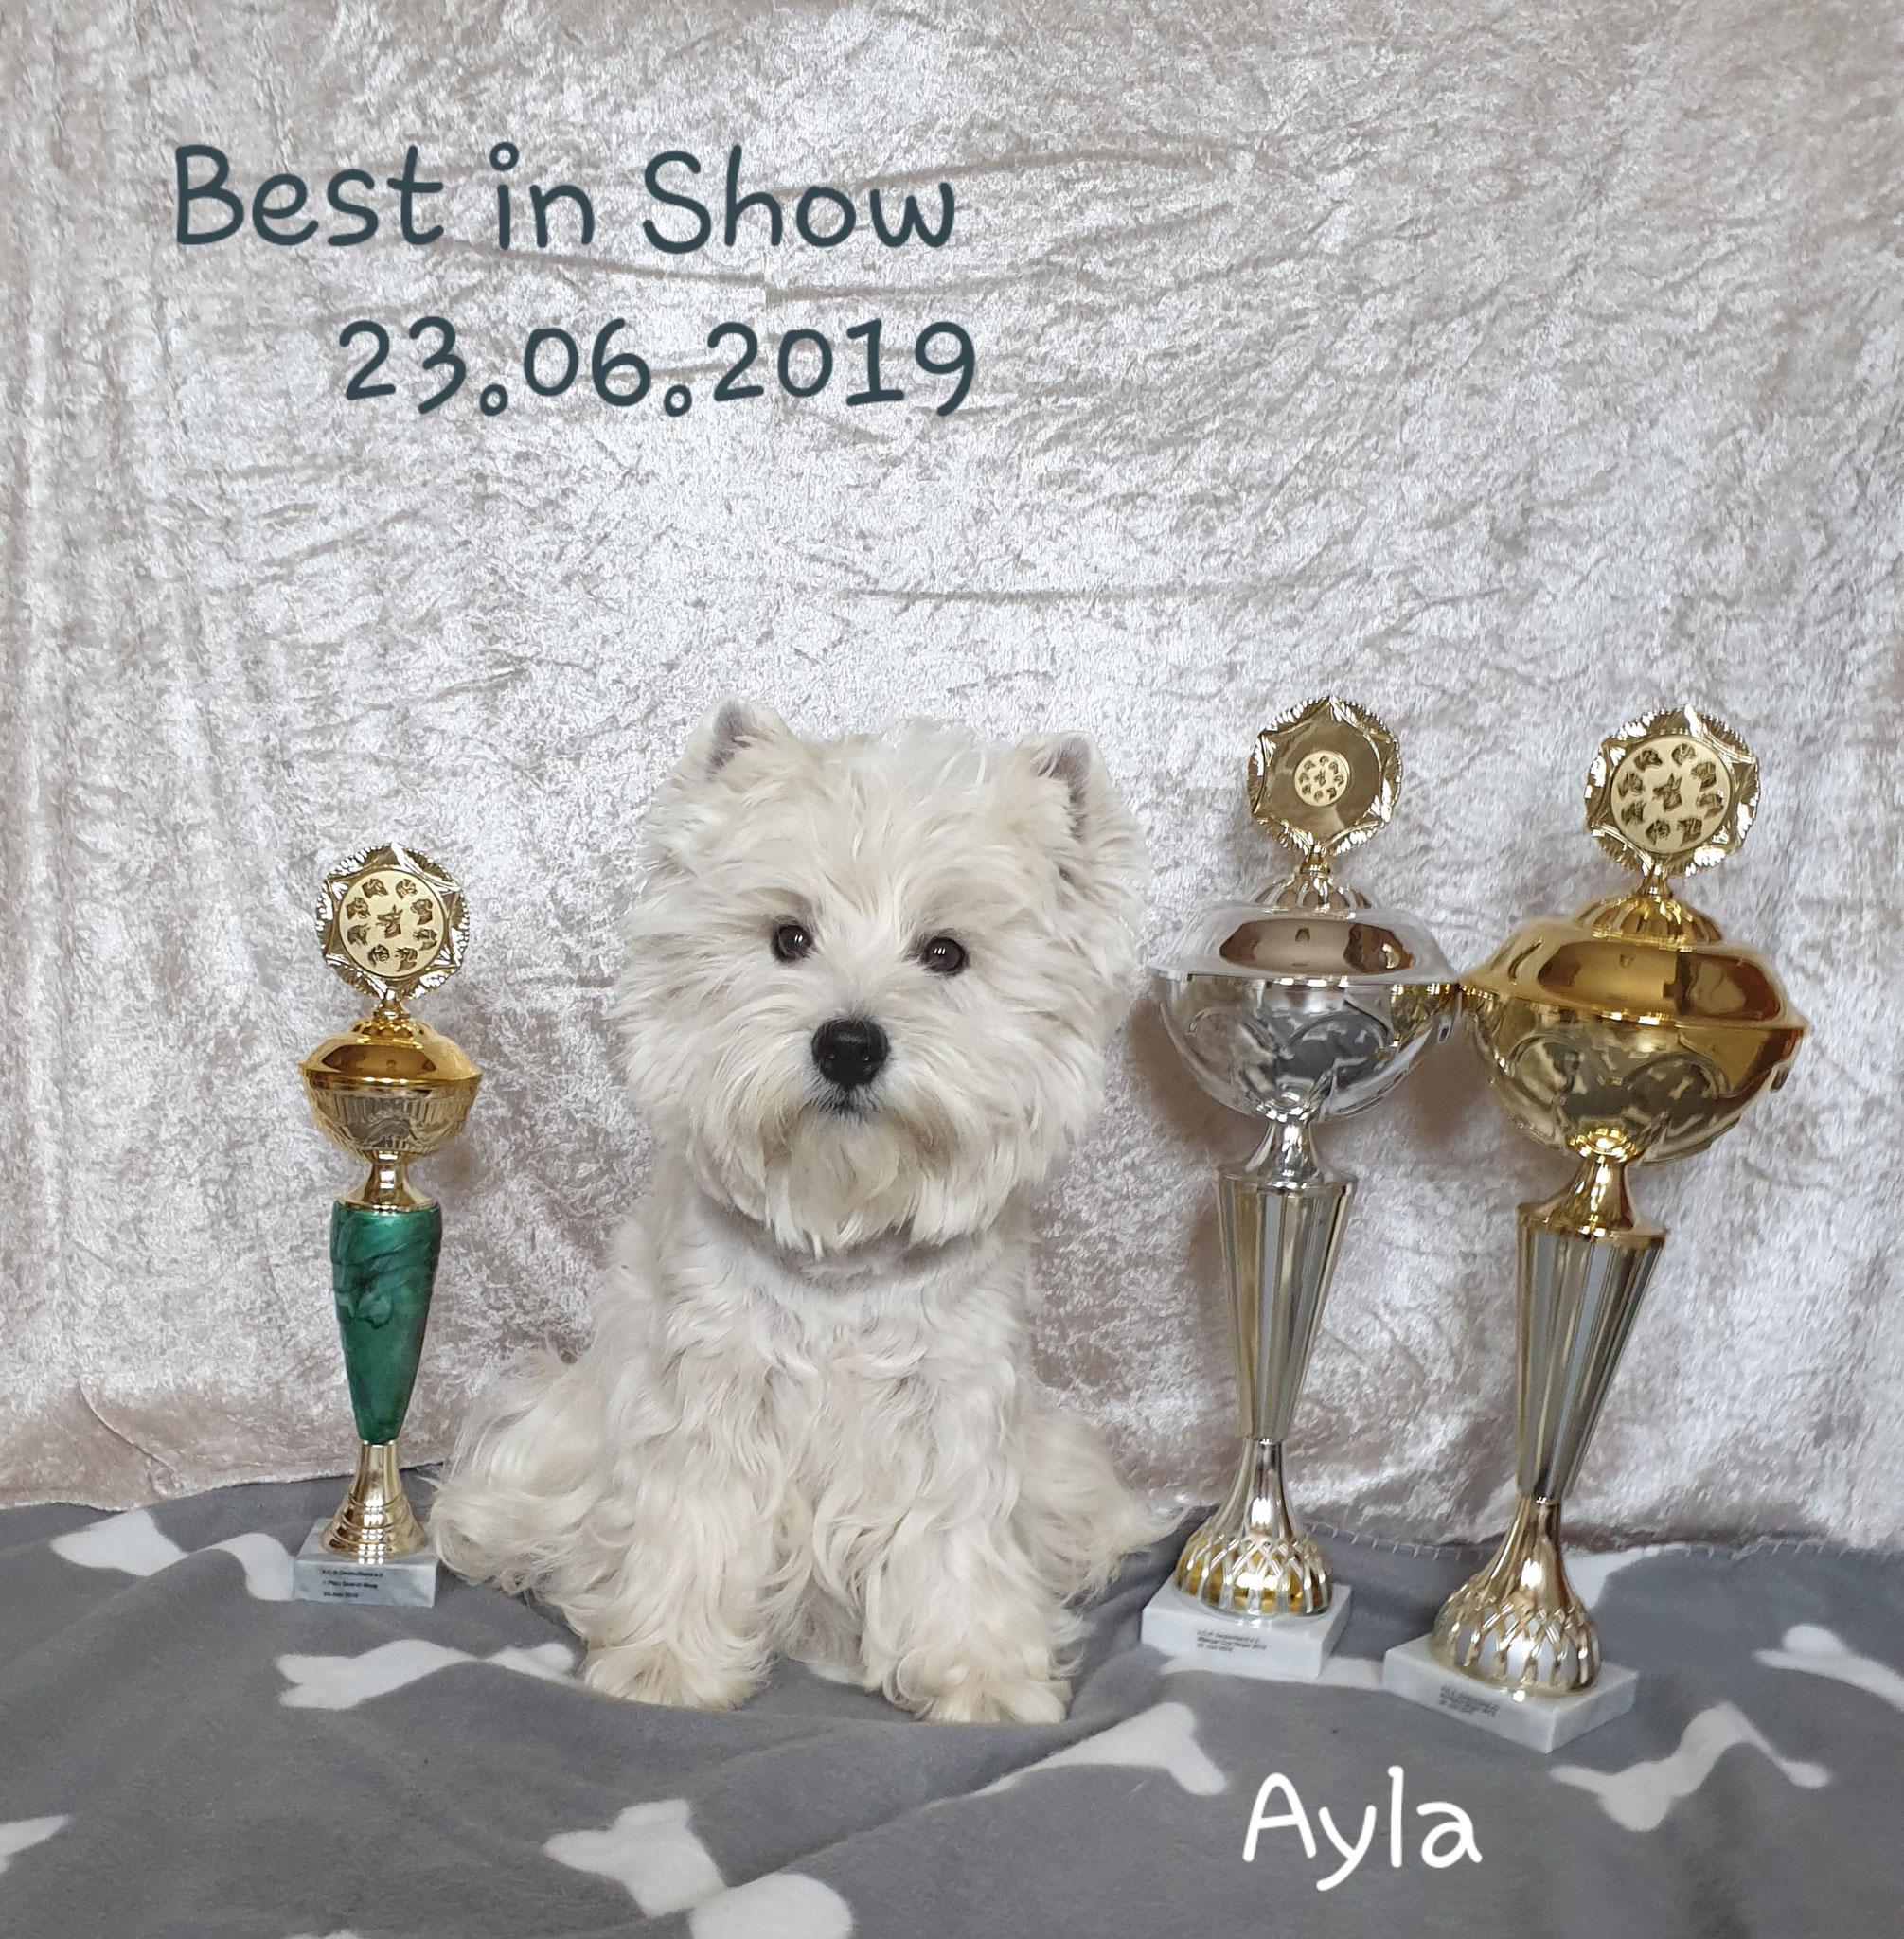 "Ayla ""Best in Show"" 23.06.2019"